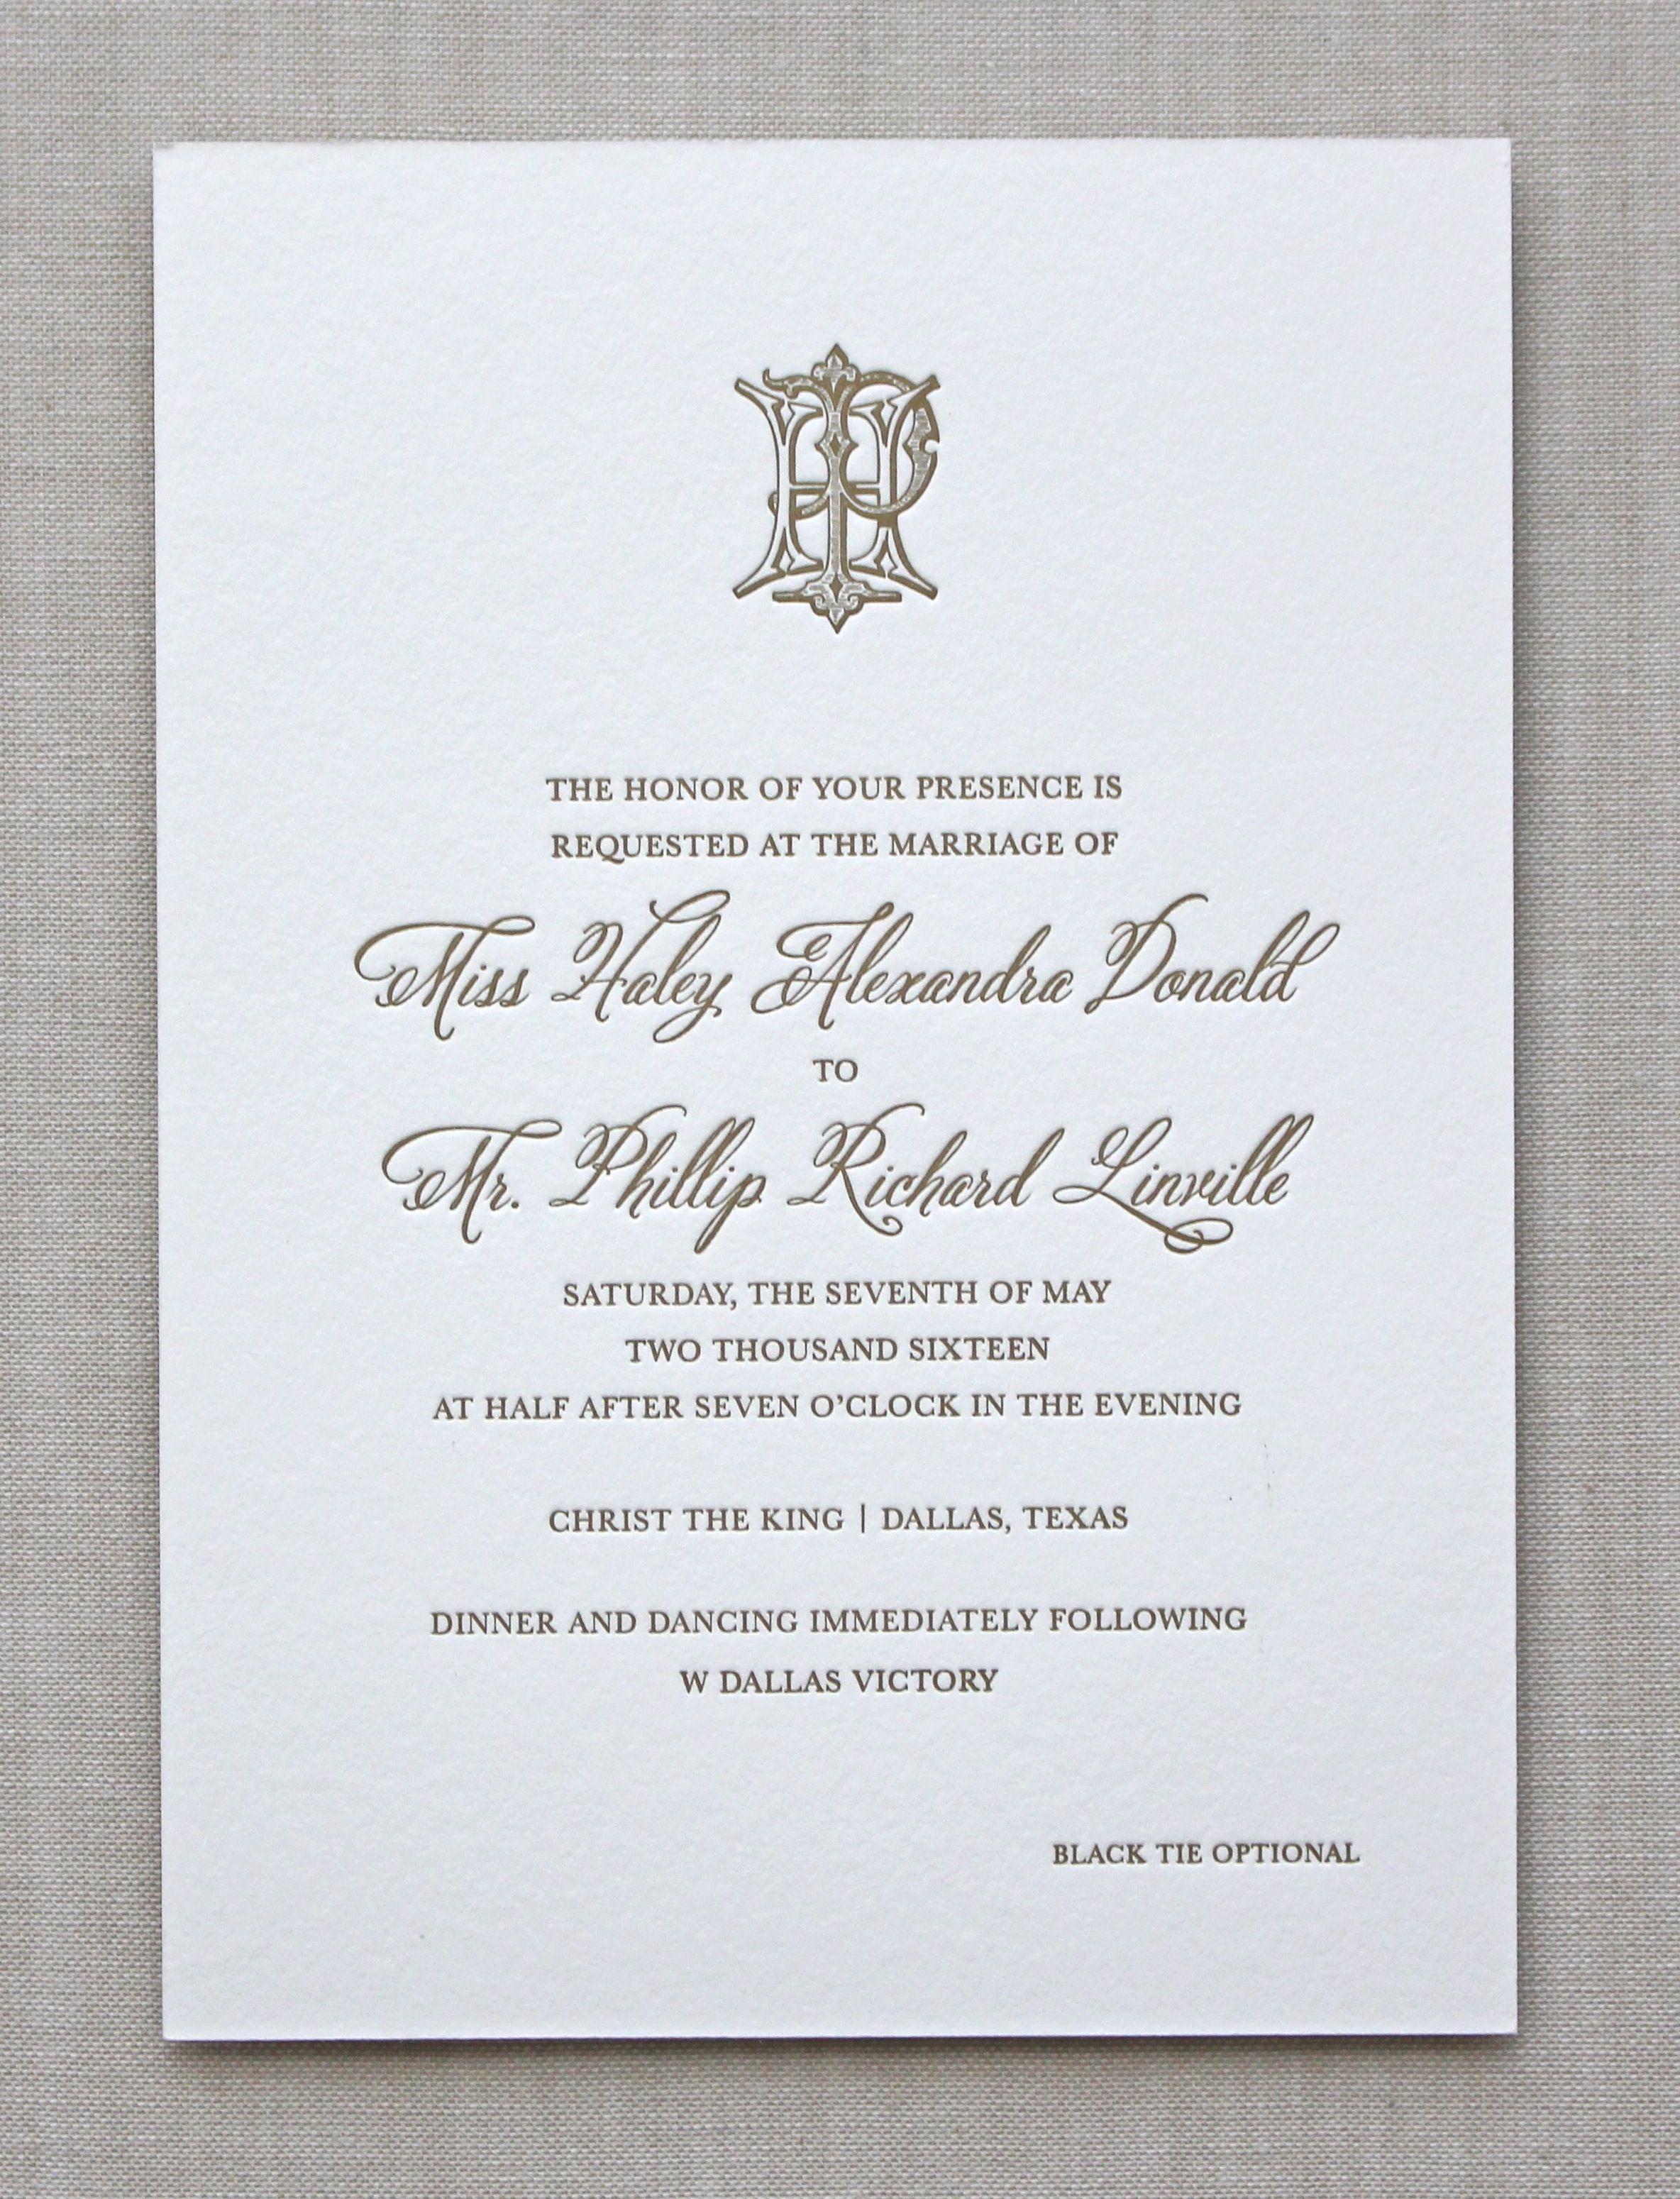 wedding invitation date wording etiquette%0A Beautiful wedding invitations